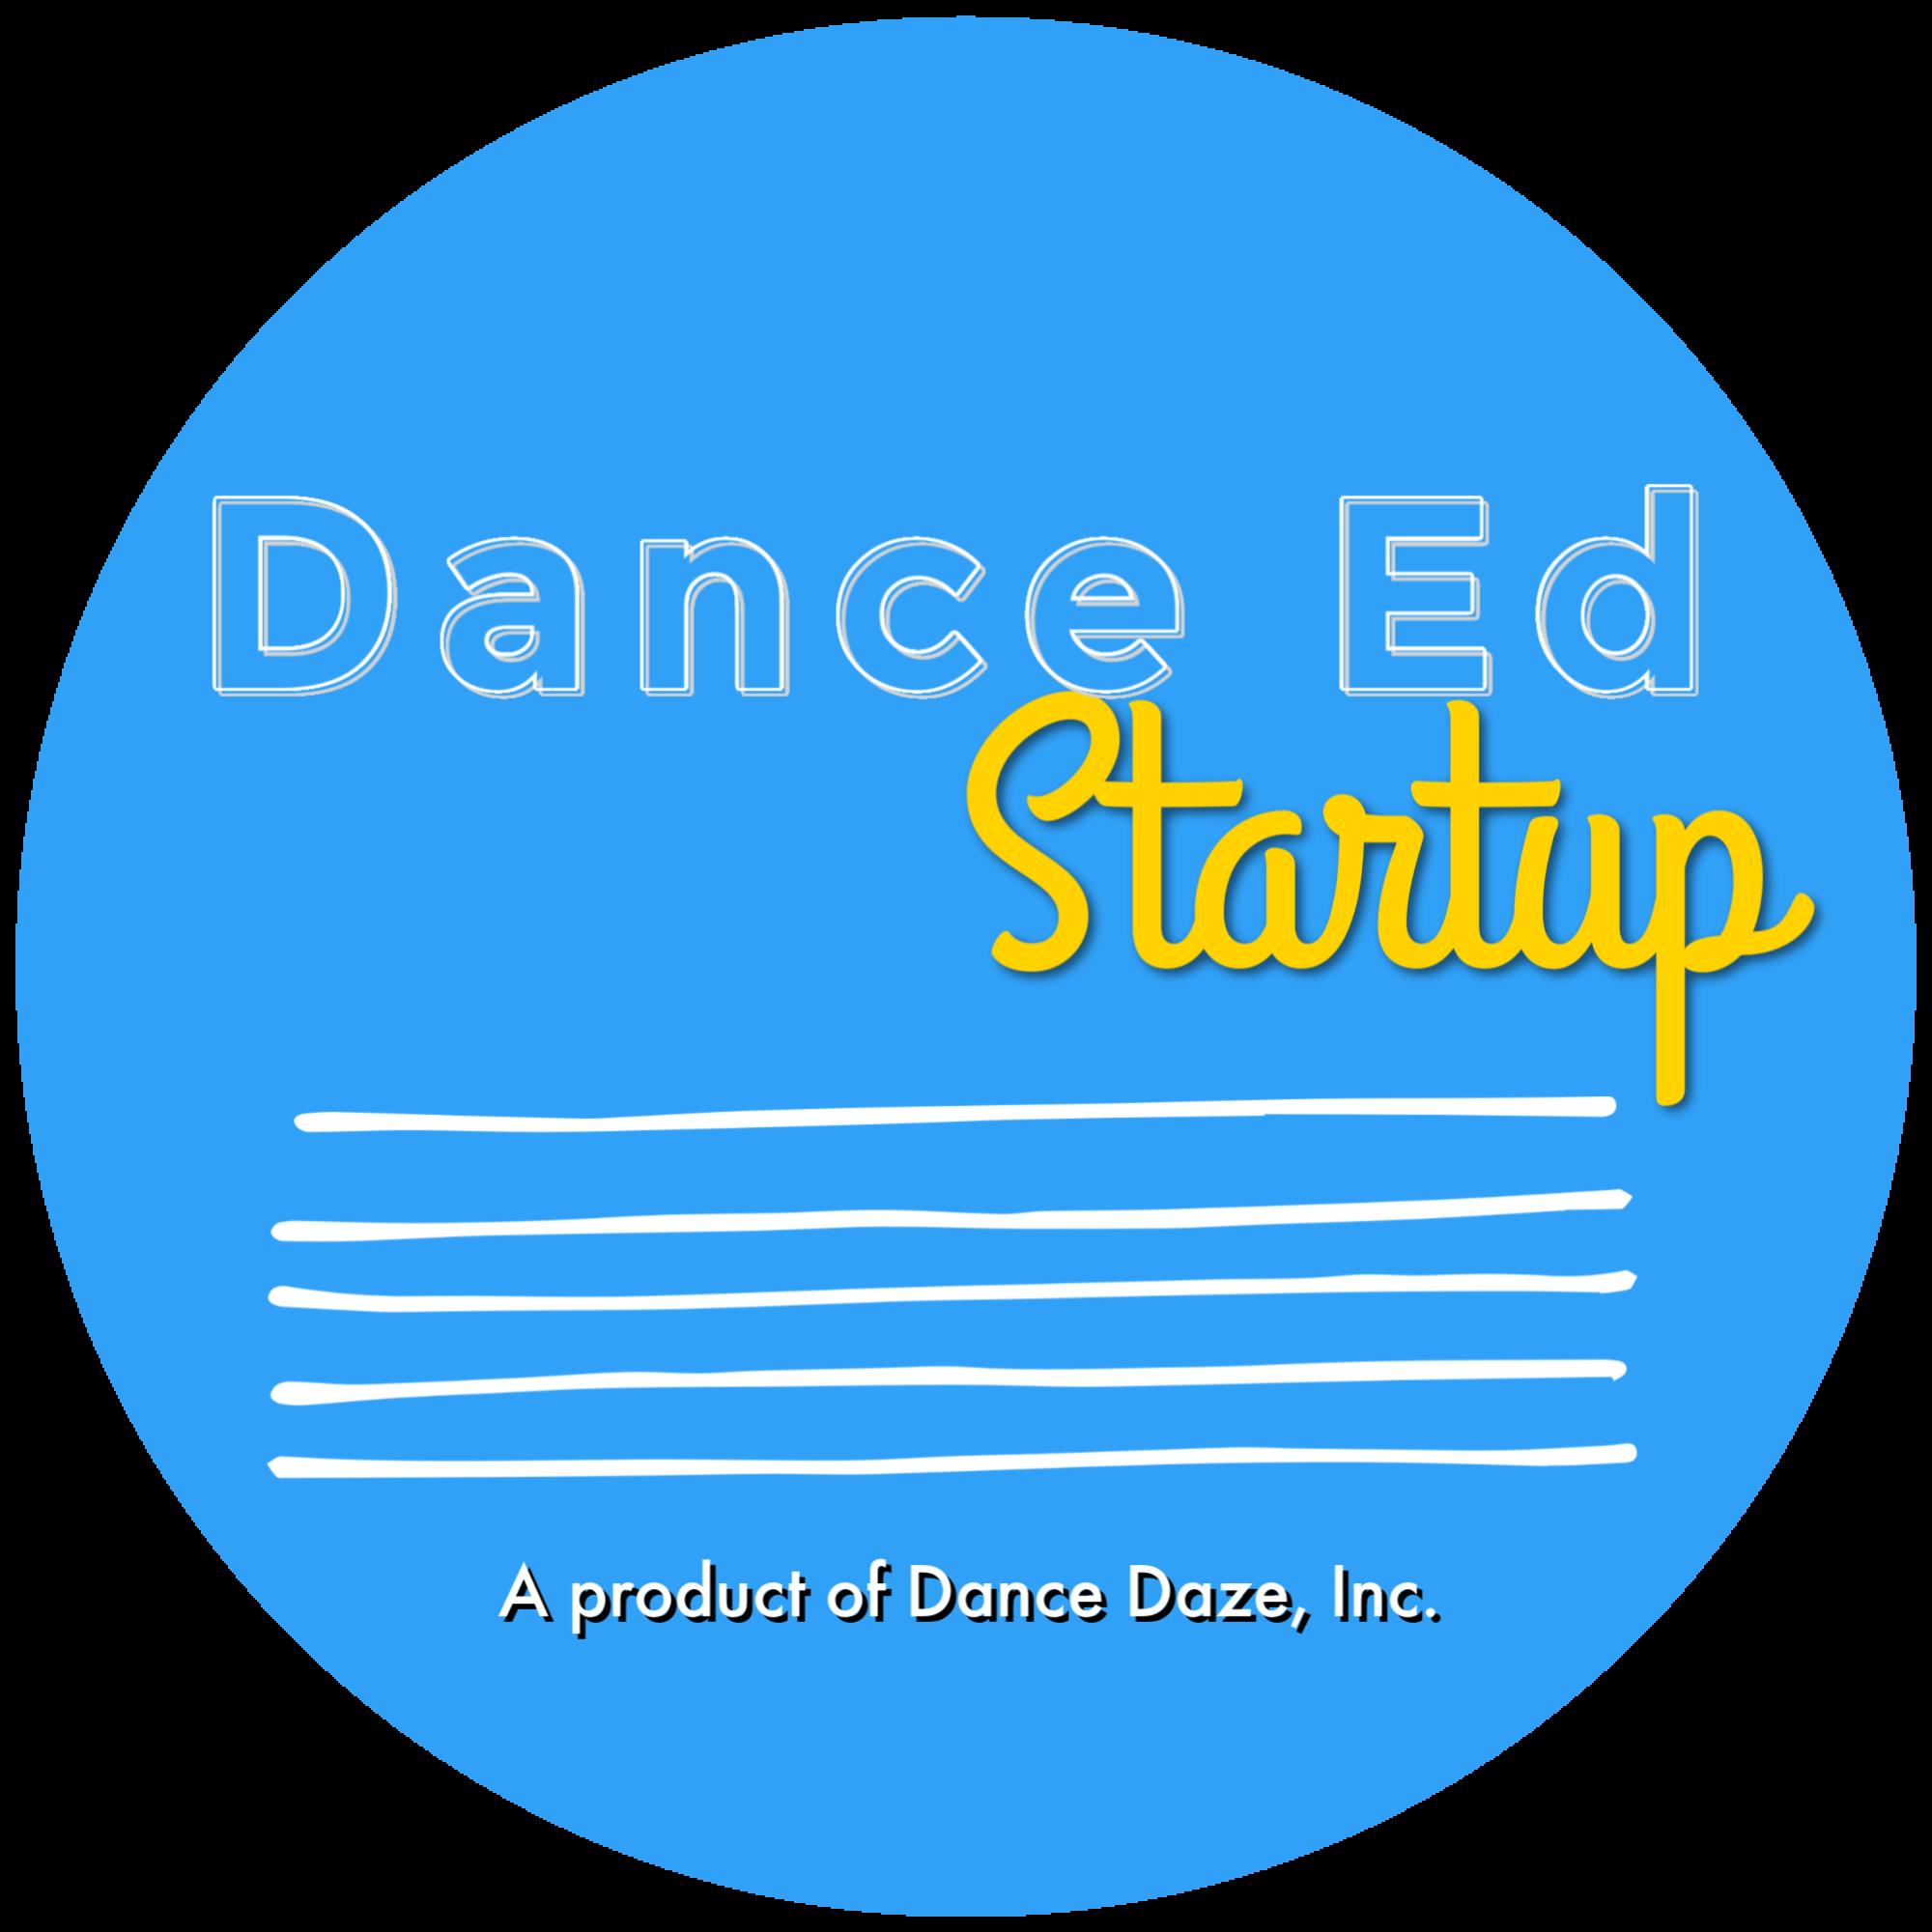 DanceEdStartup.com by Saumirah McWoodson